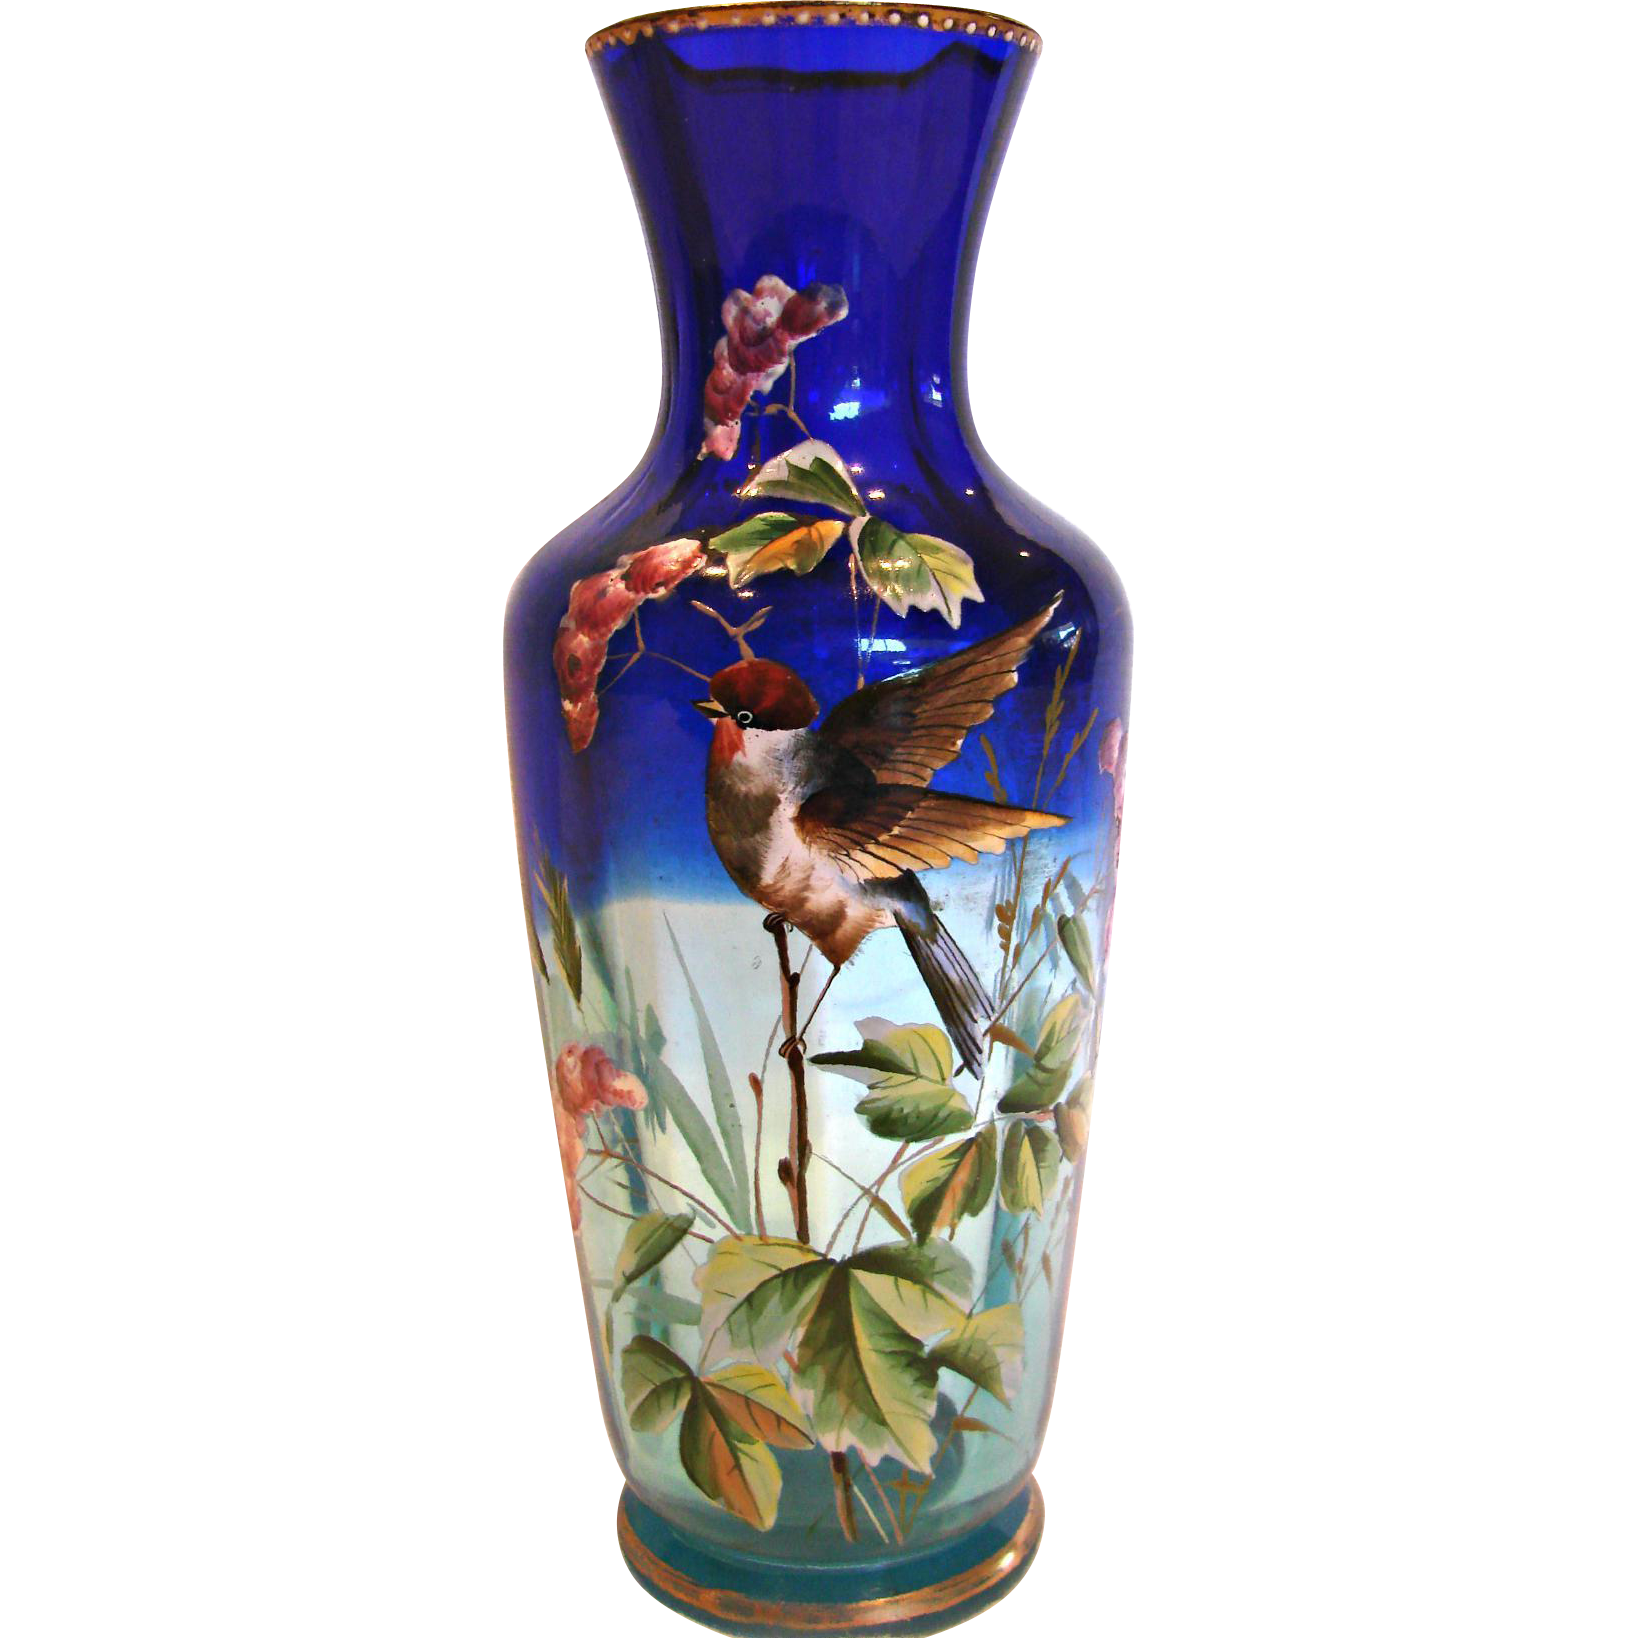 Antique 50 shades of bdsm glassdeskproductions - 4 9